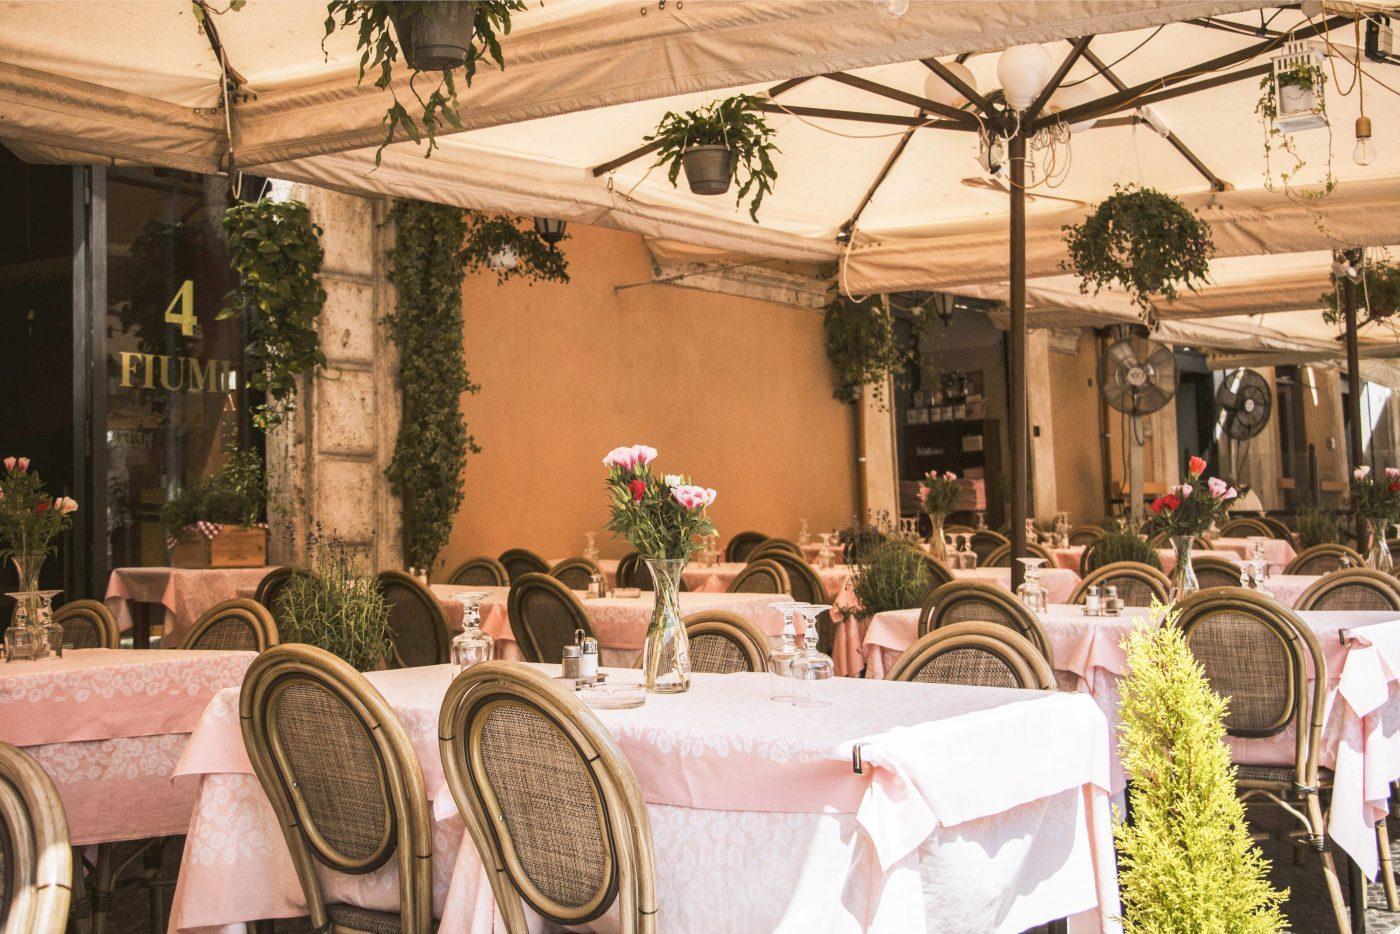 4 fiumi restaurant and pizzeria piazza navona rome